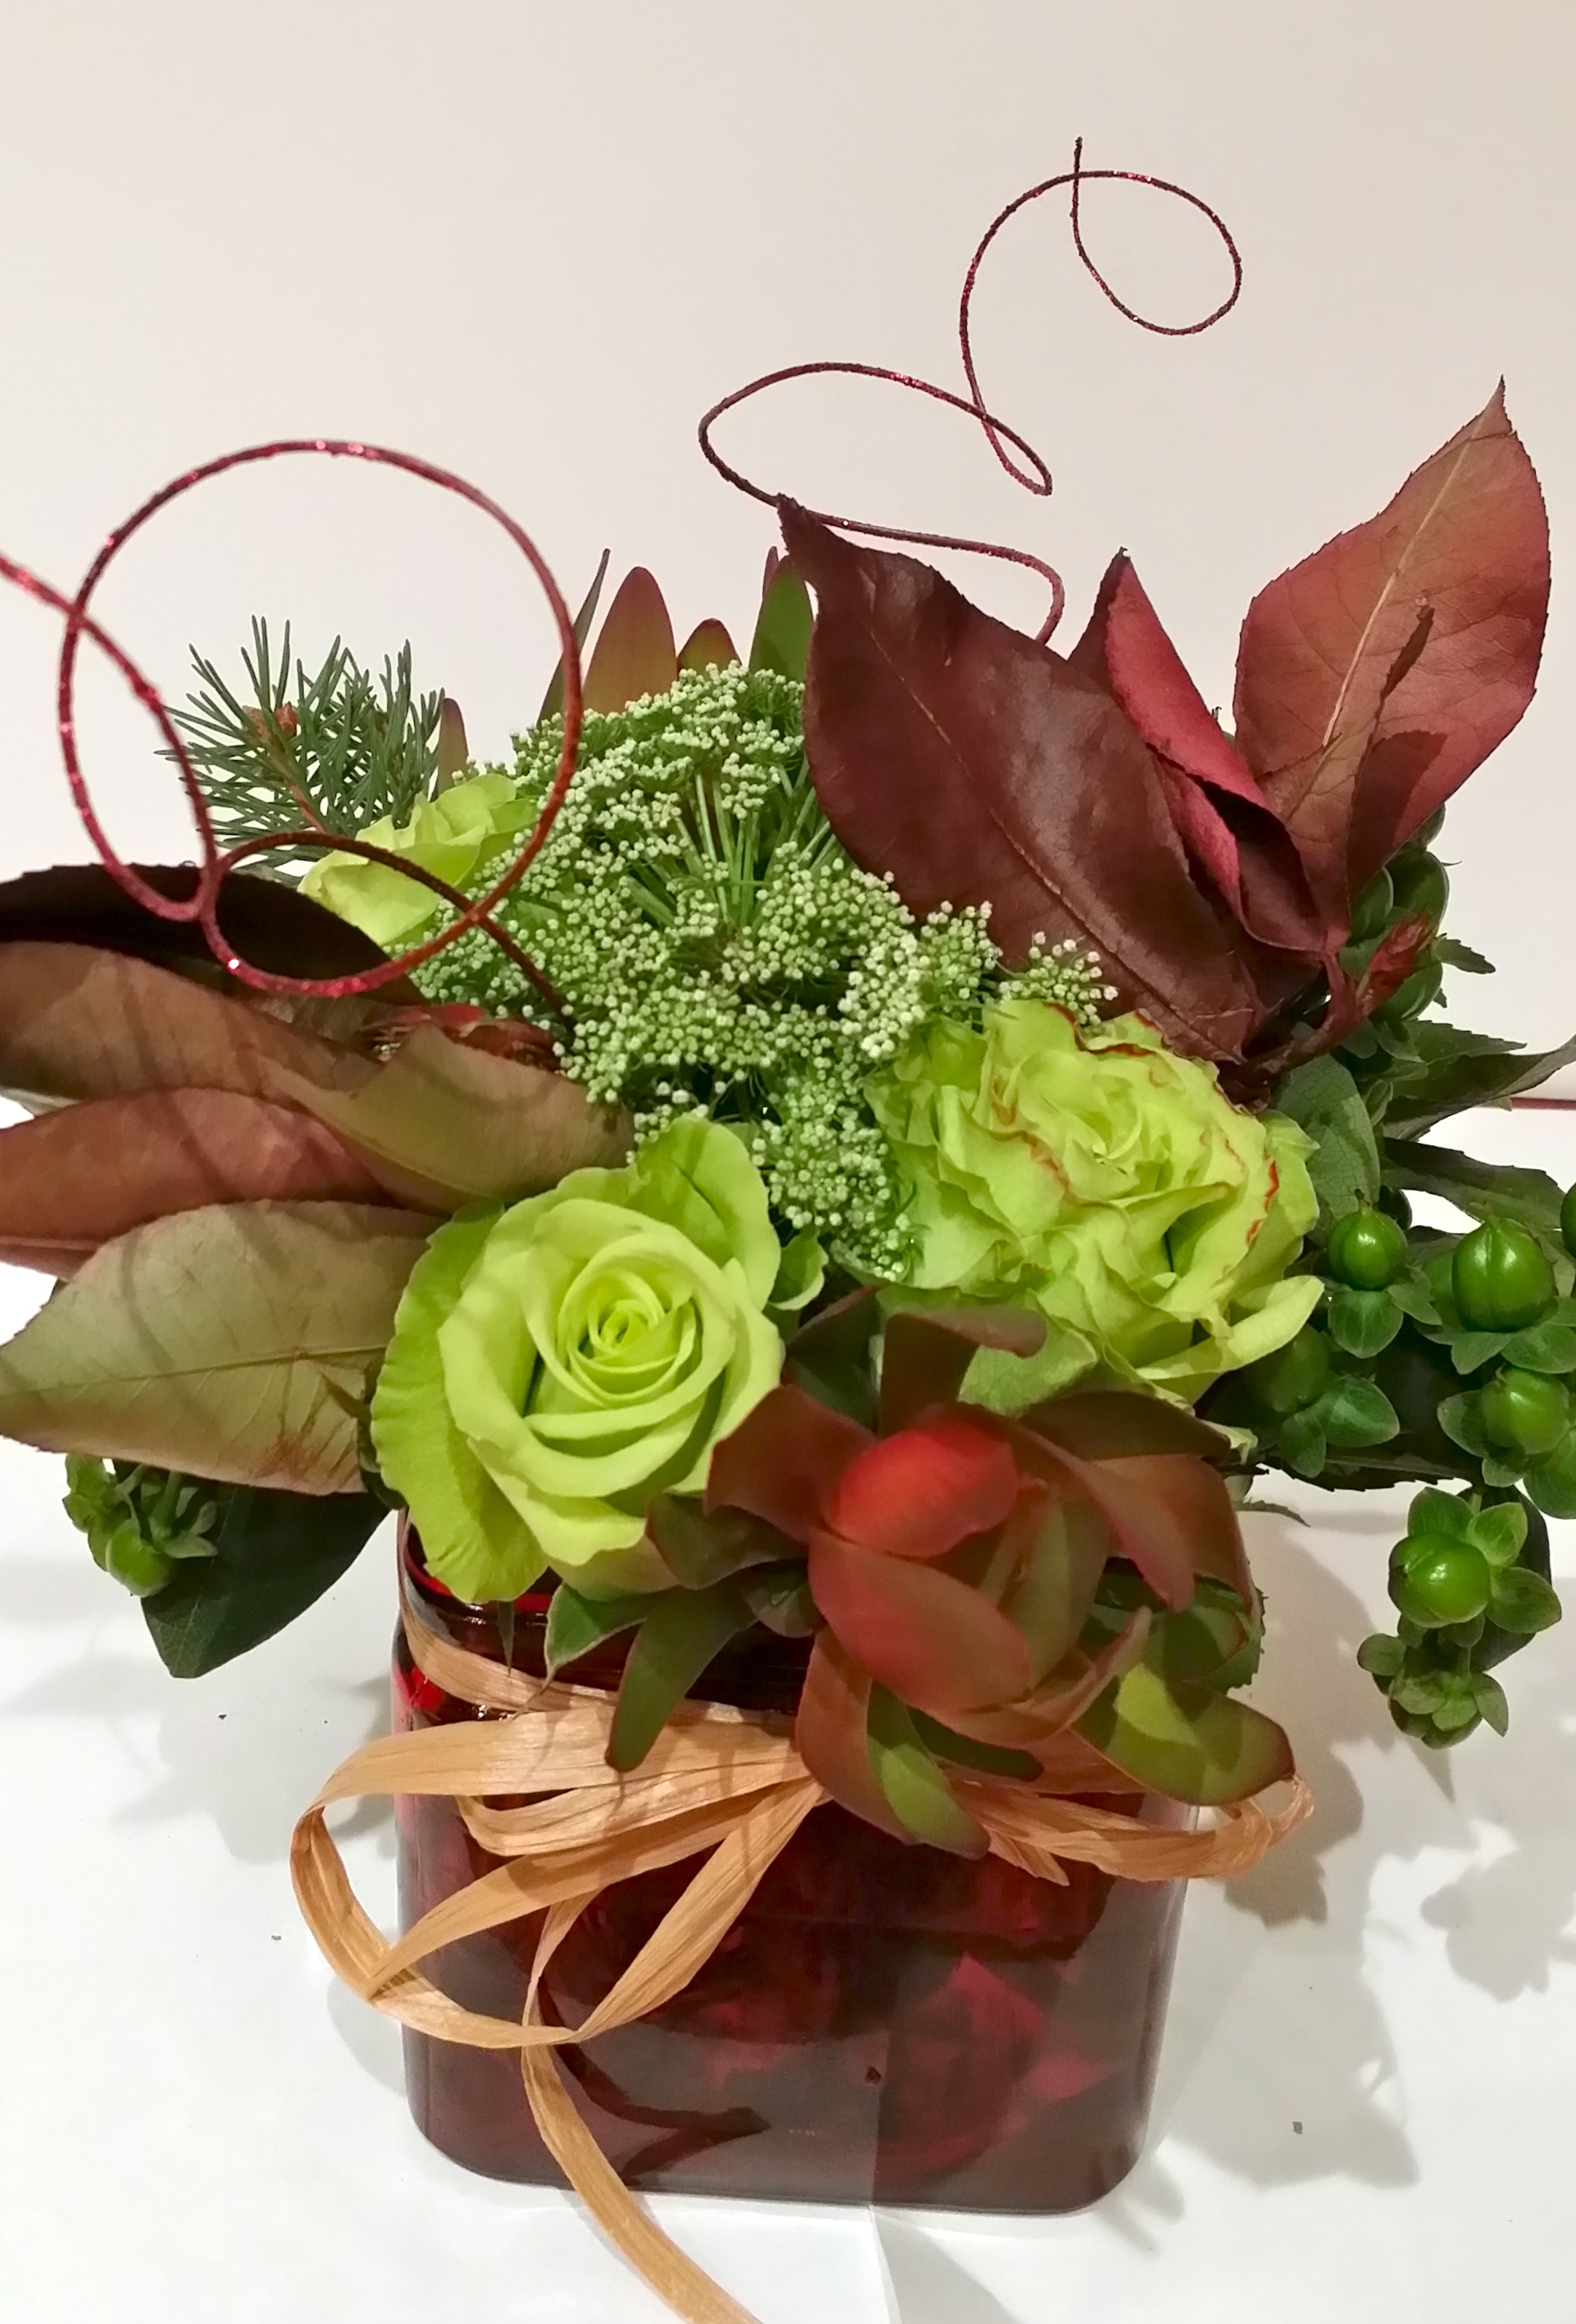 Super Green Roses, Hypericum Berries,